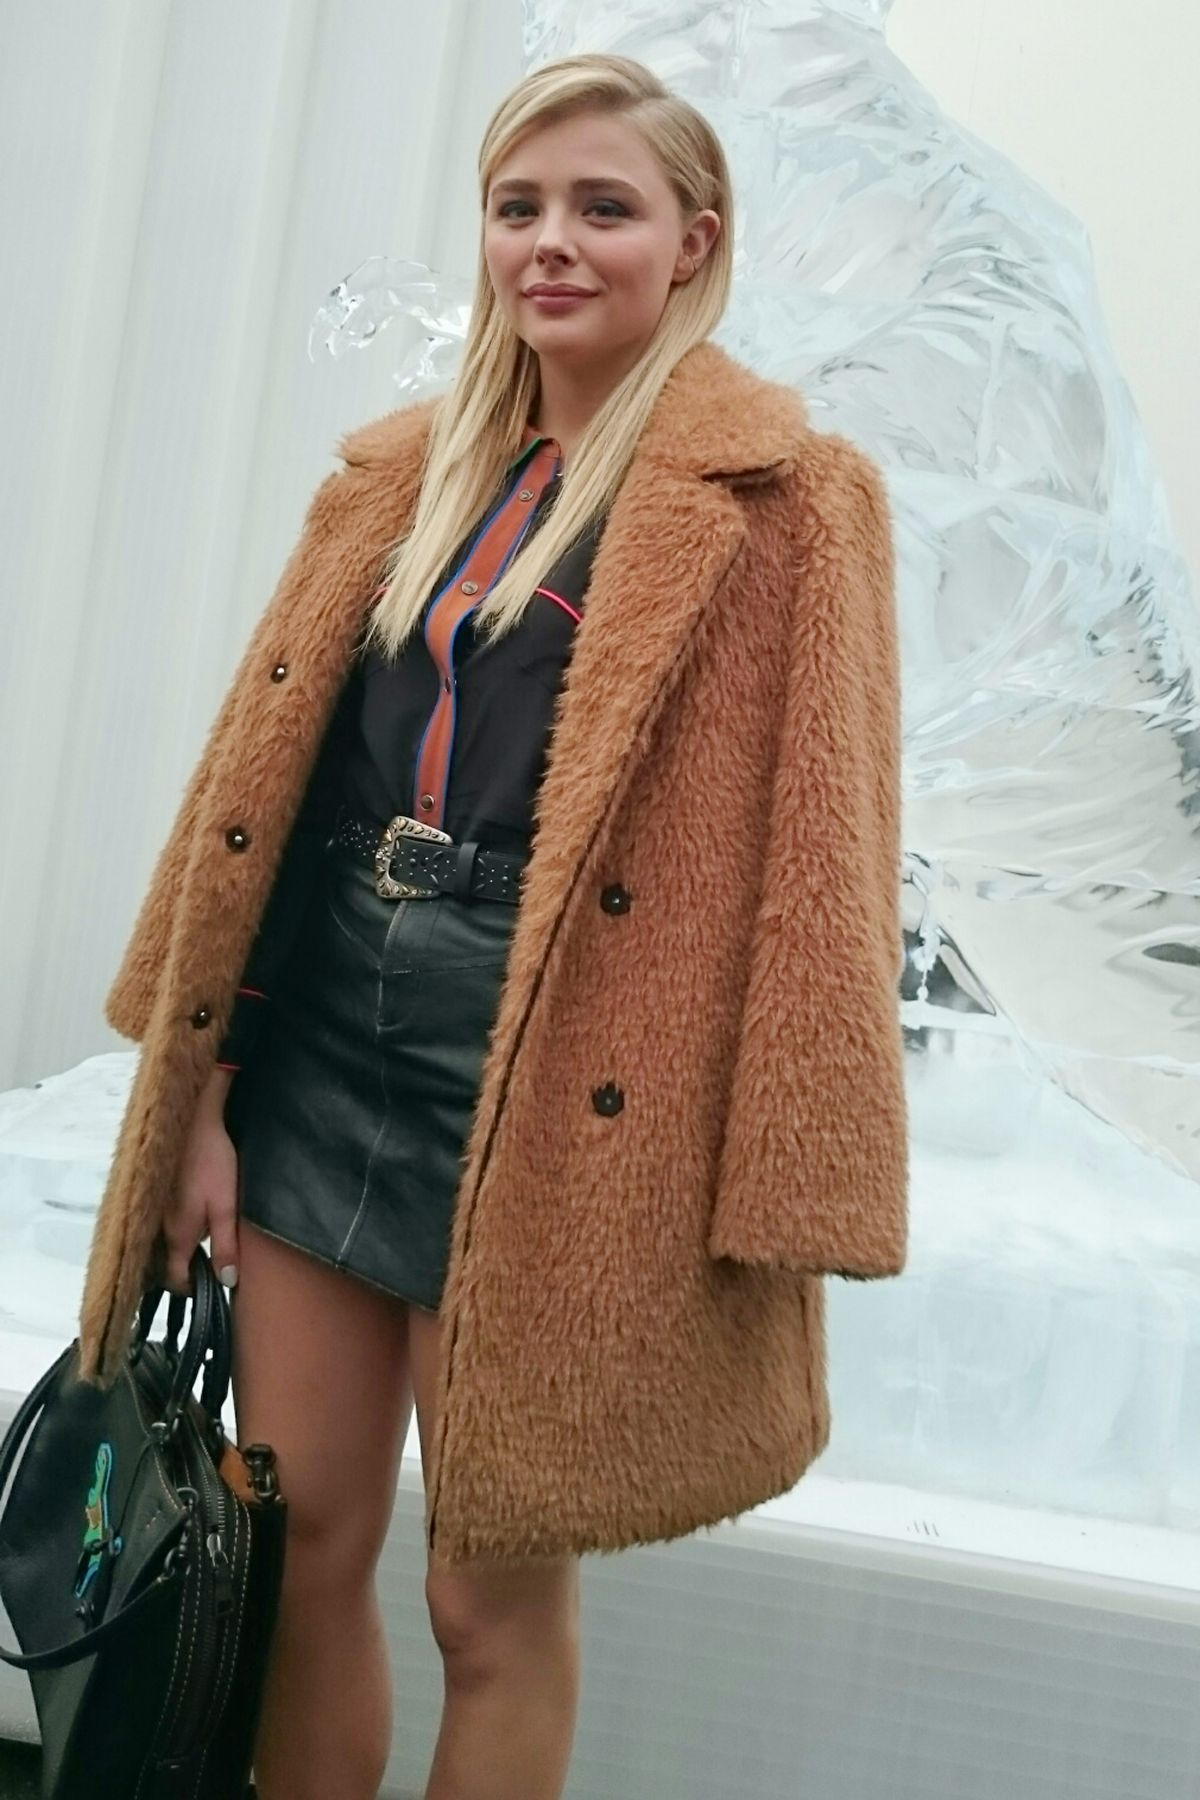 Style Double Shot: Chloë Moretz in NYC | Tom + Lorenzo